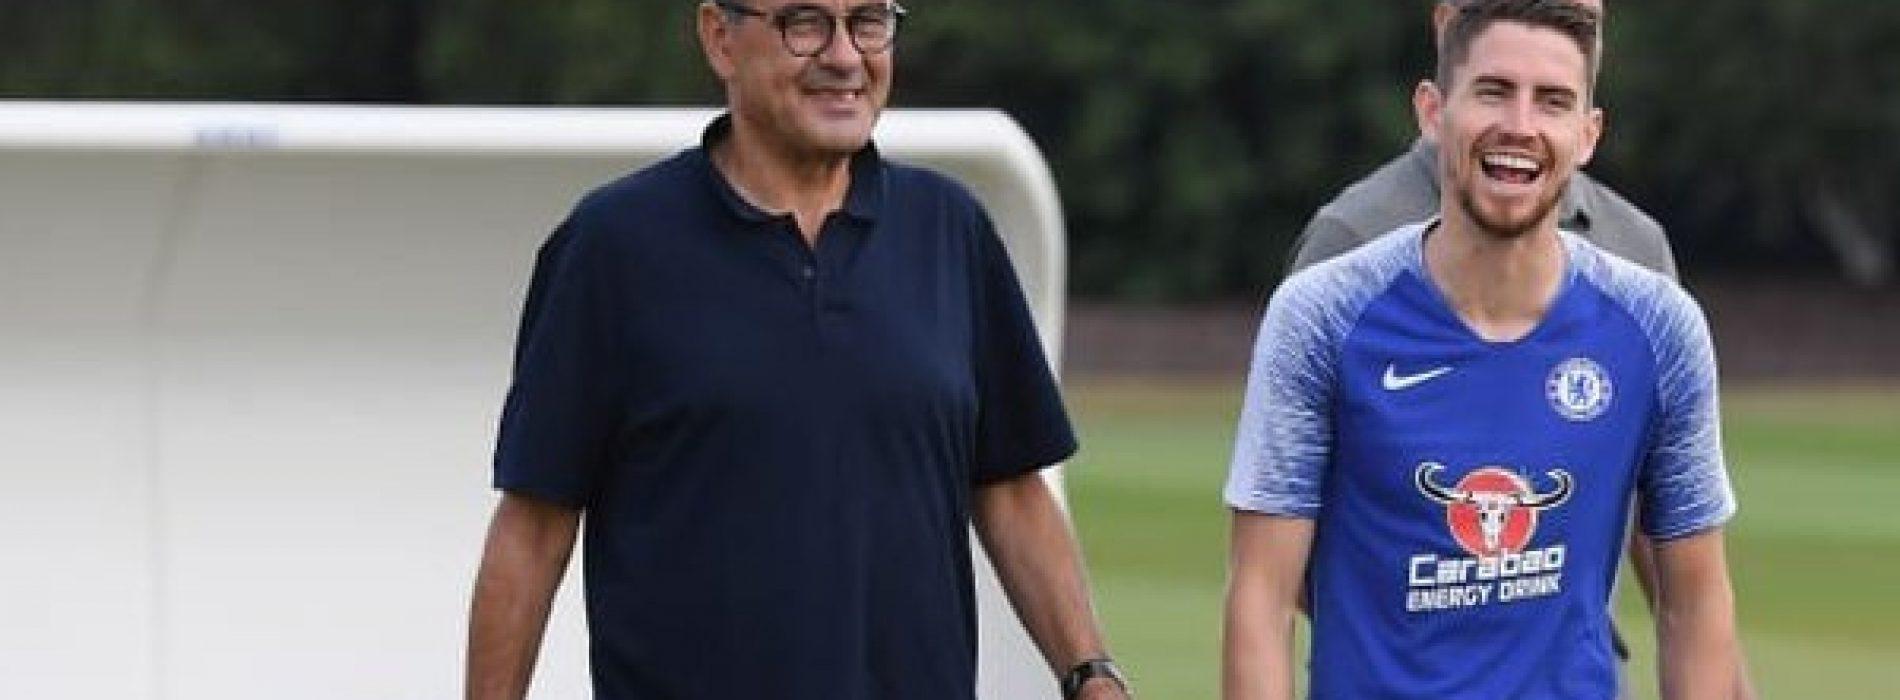 Pjanic-Jorginho: Juventus e Chelsea stanno pensando allo scambio